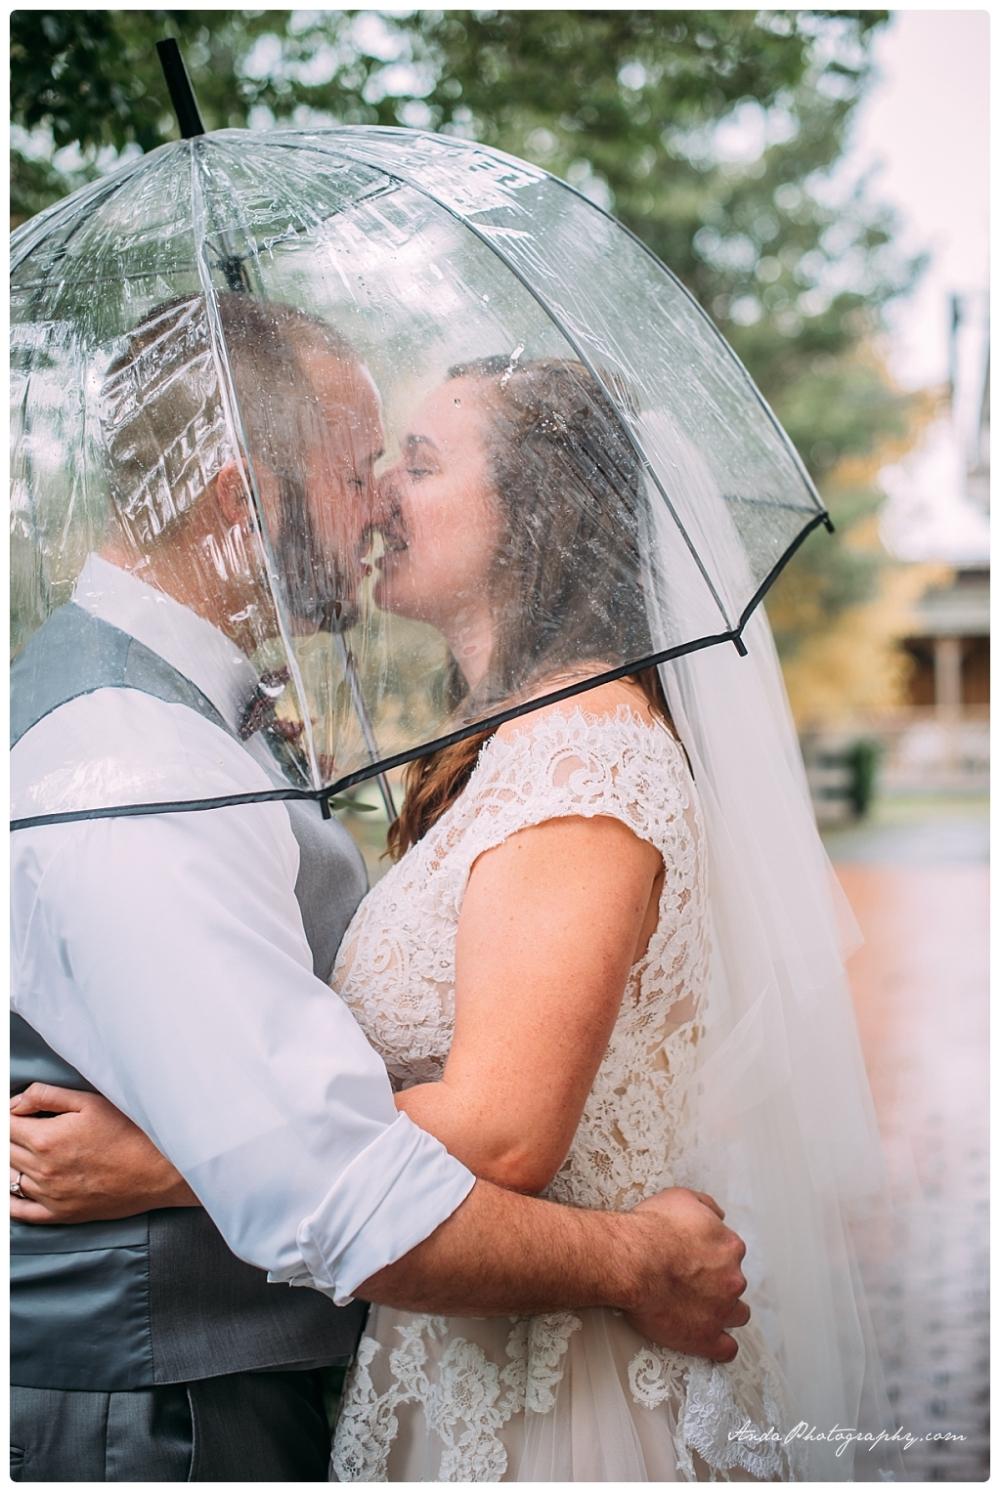 Anda Photography Bellingham wedding photography Bellingham lifestyle wedding photographer Maplehurst Farms_0039